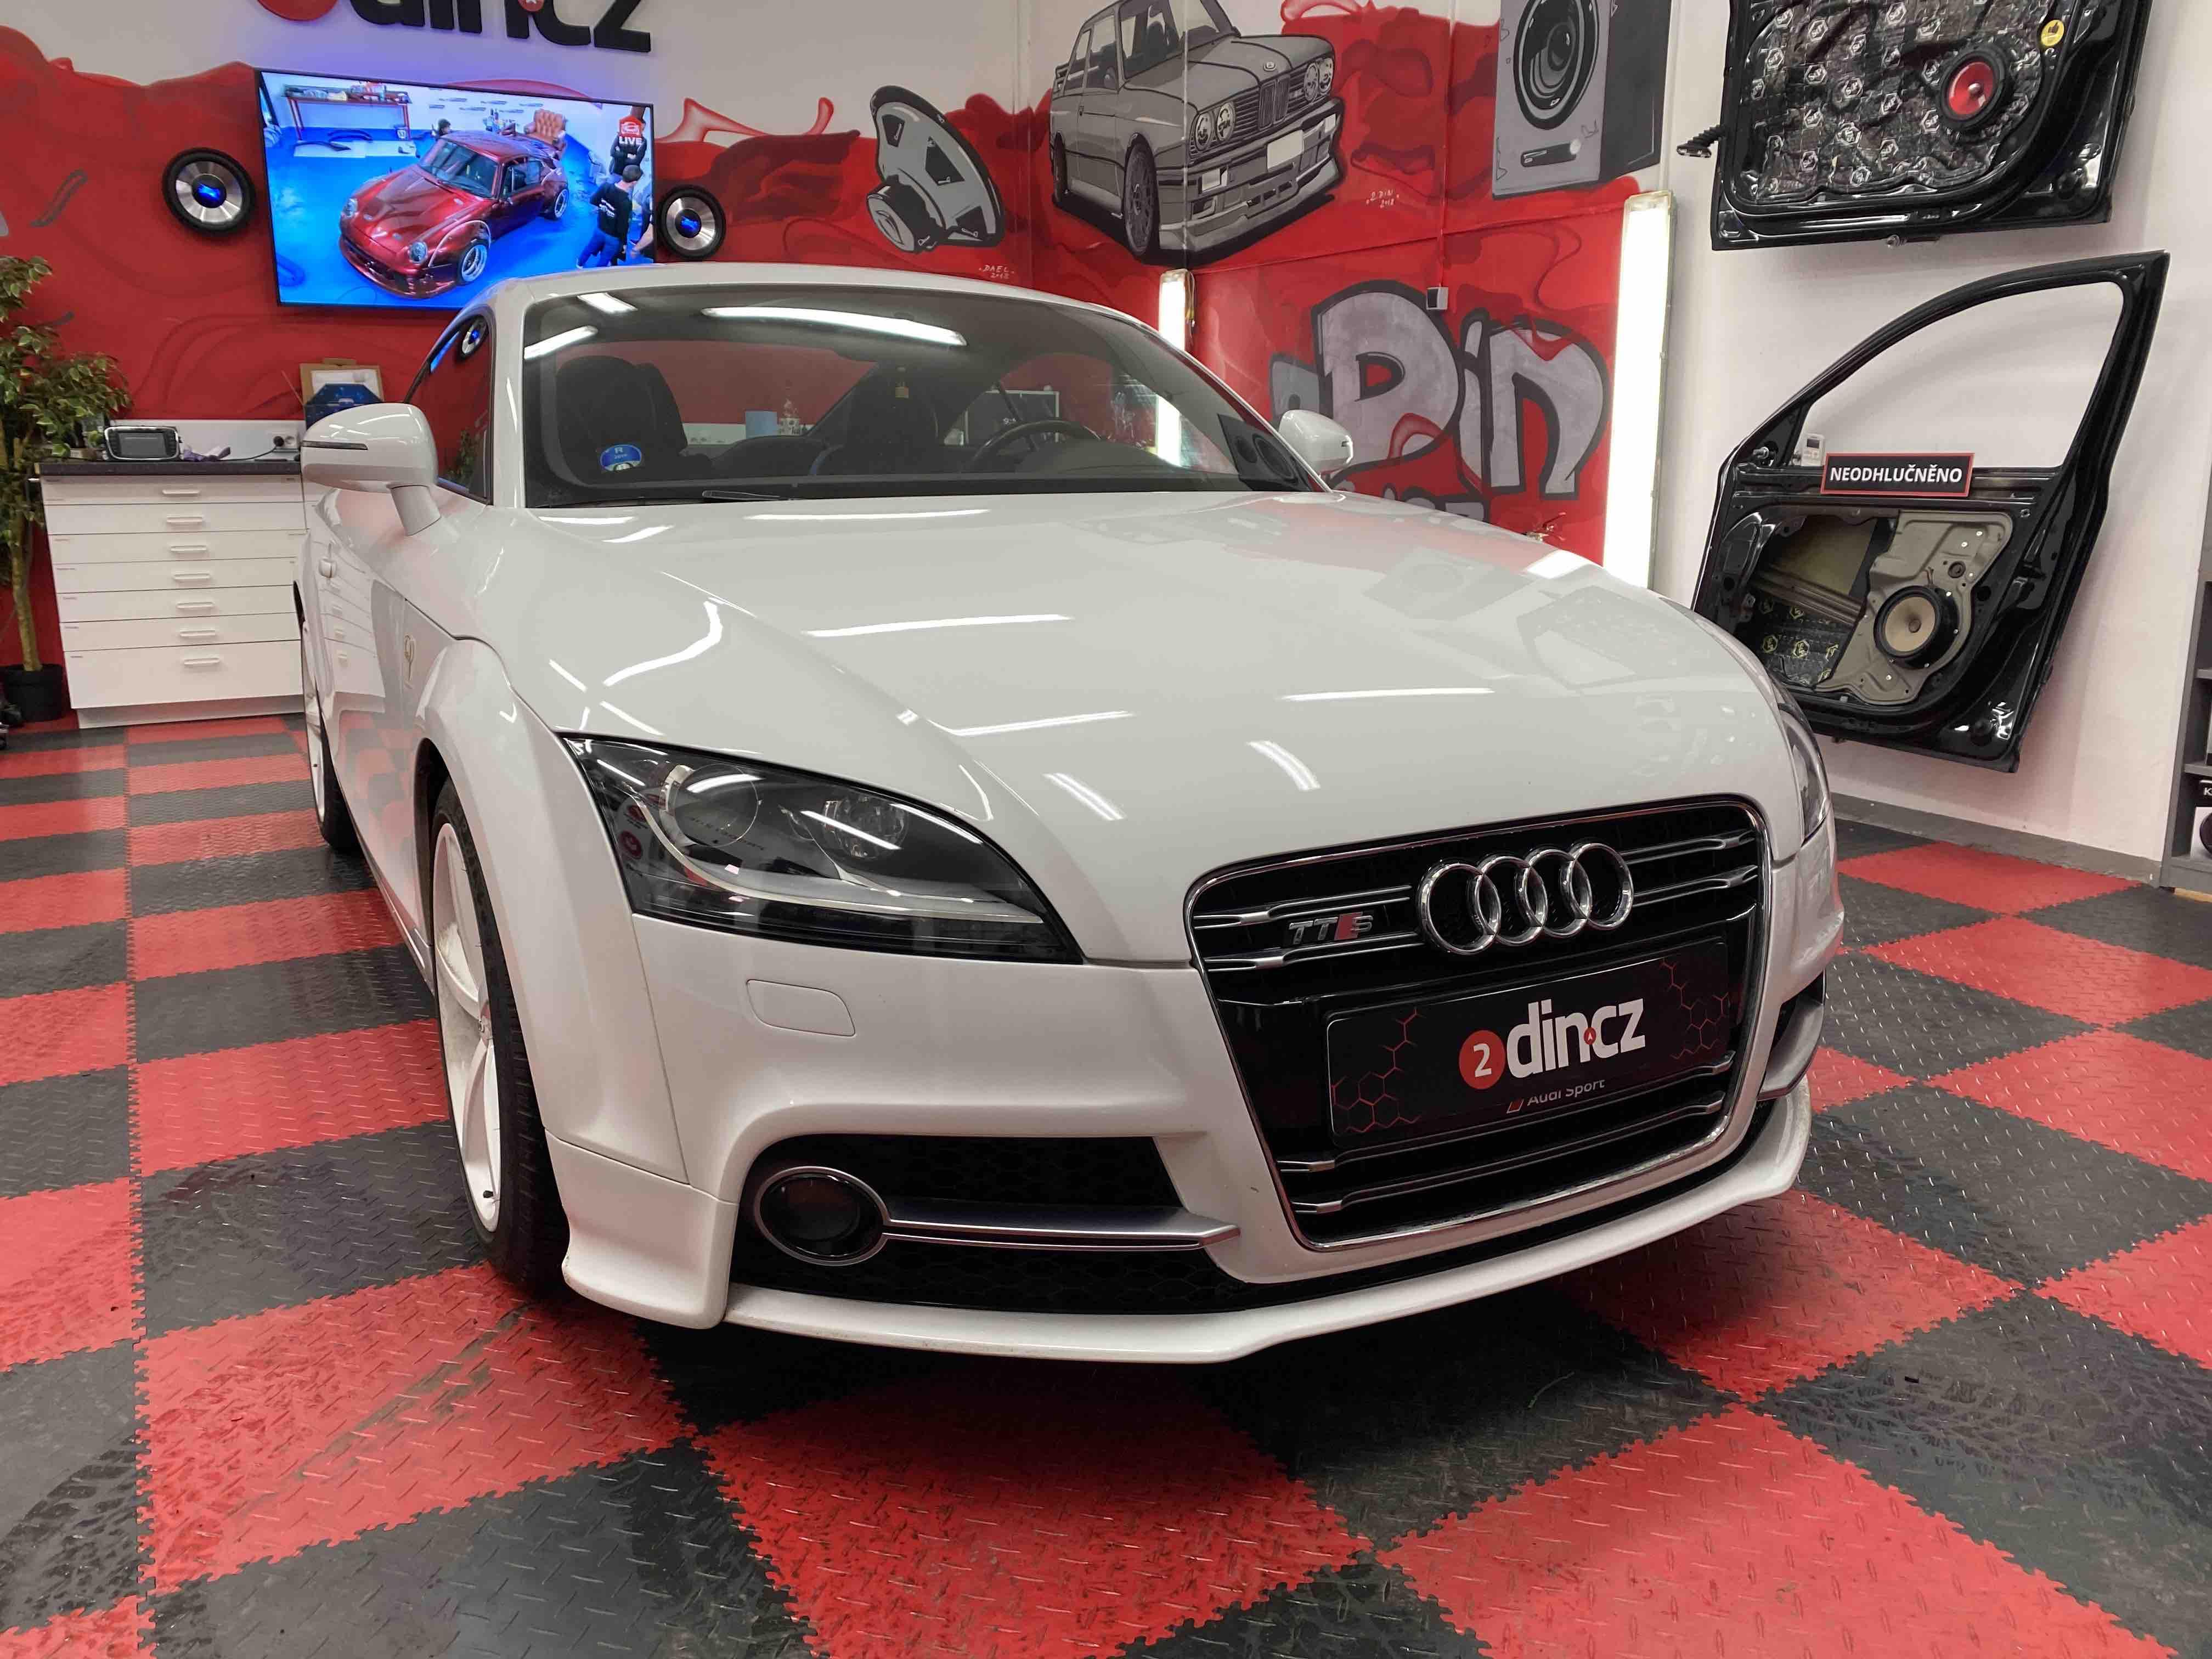 Audi TT - Montáž aktivího subwooferu a reproduktorů